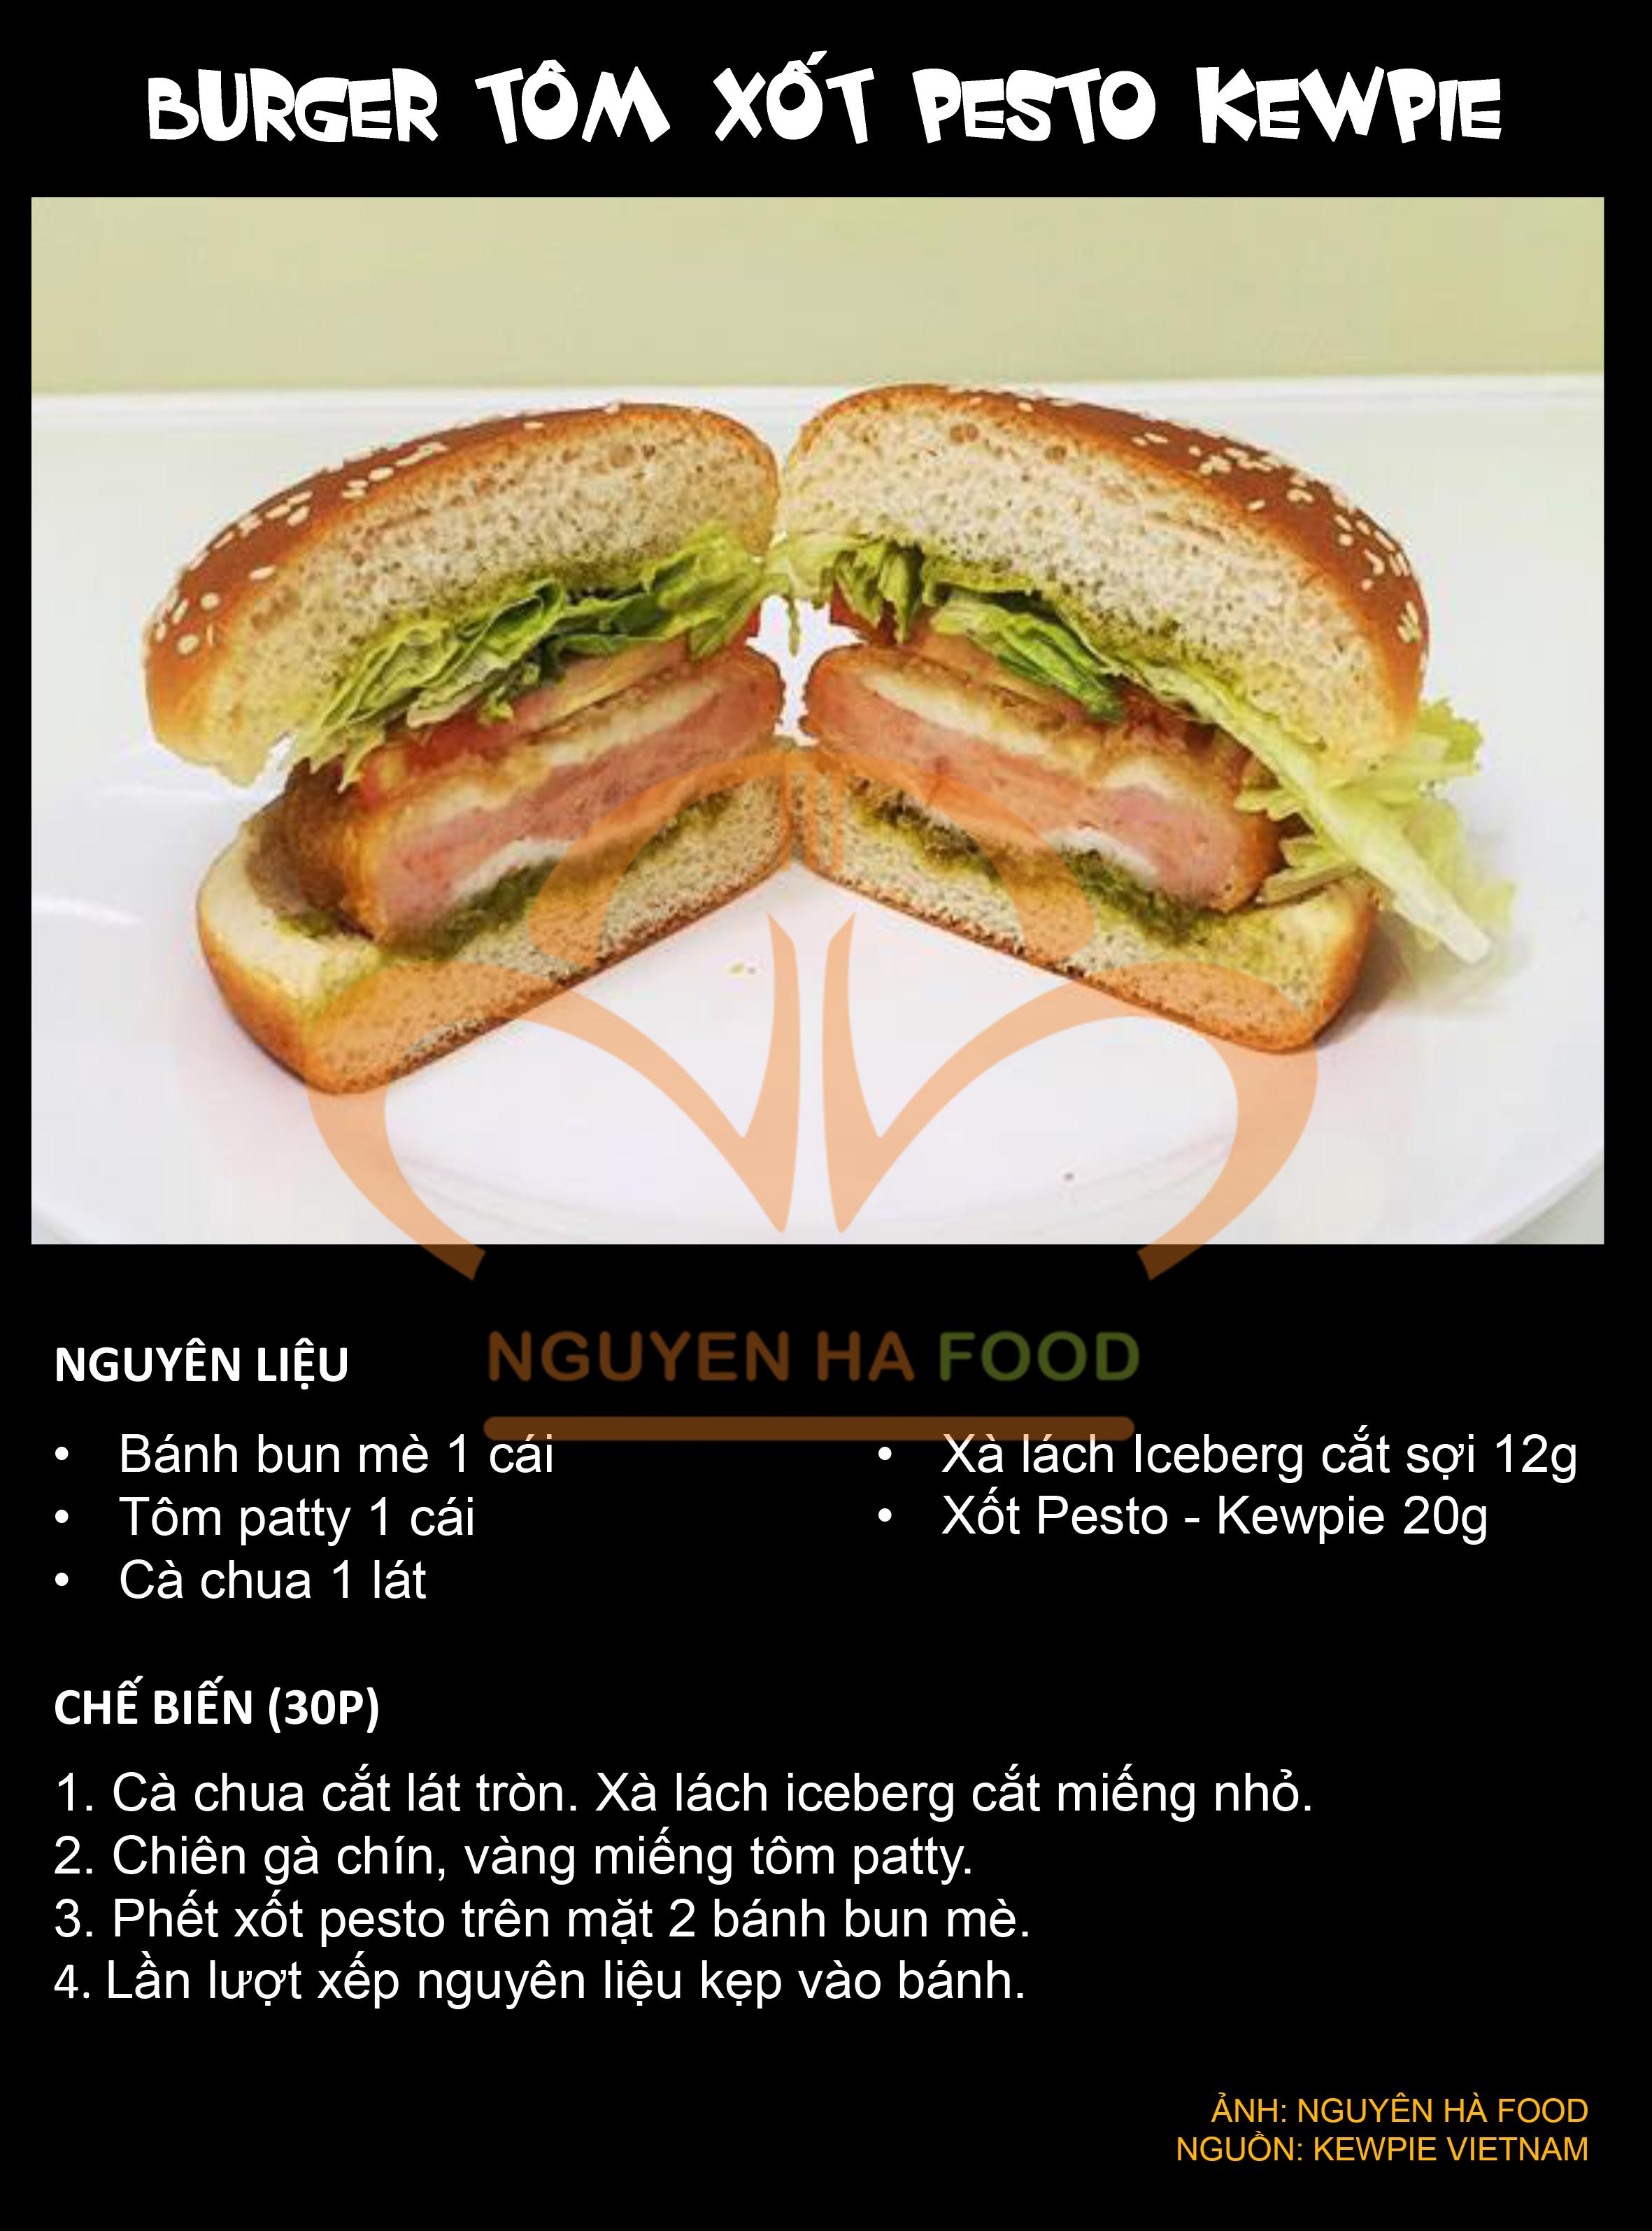 5 BURGER TOM XOT PESTO KEWPIE - NGUYEN HA FOOD